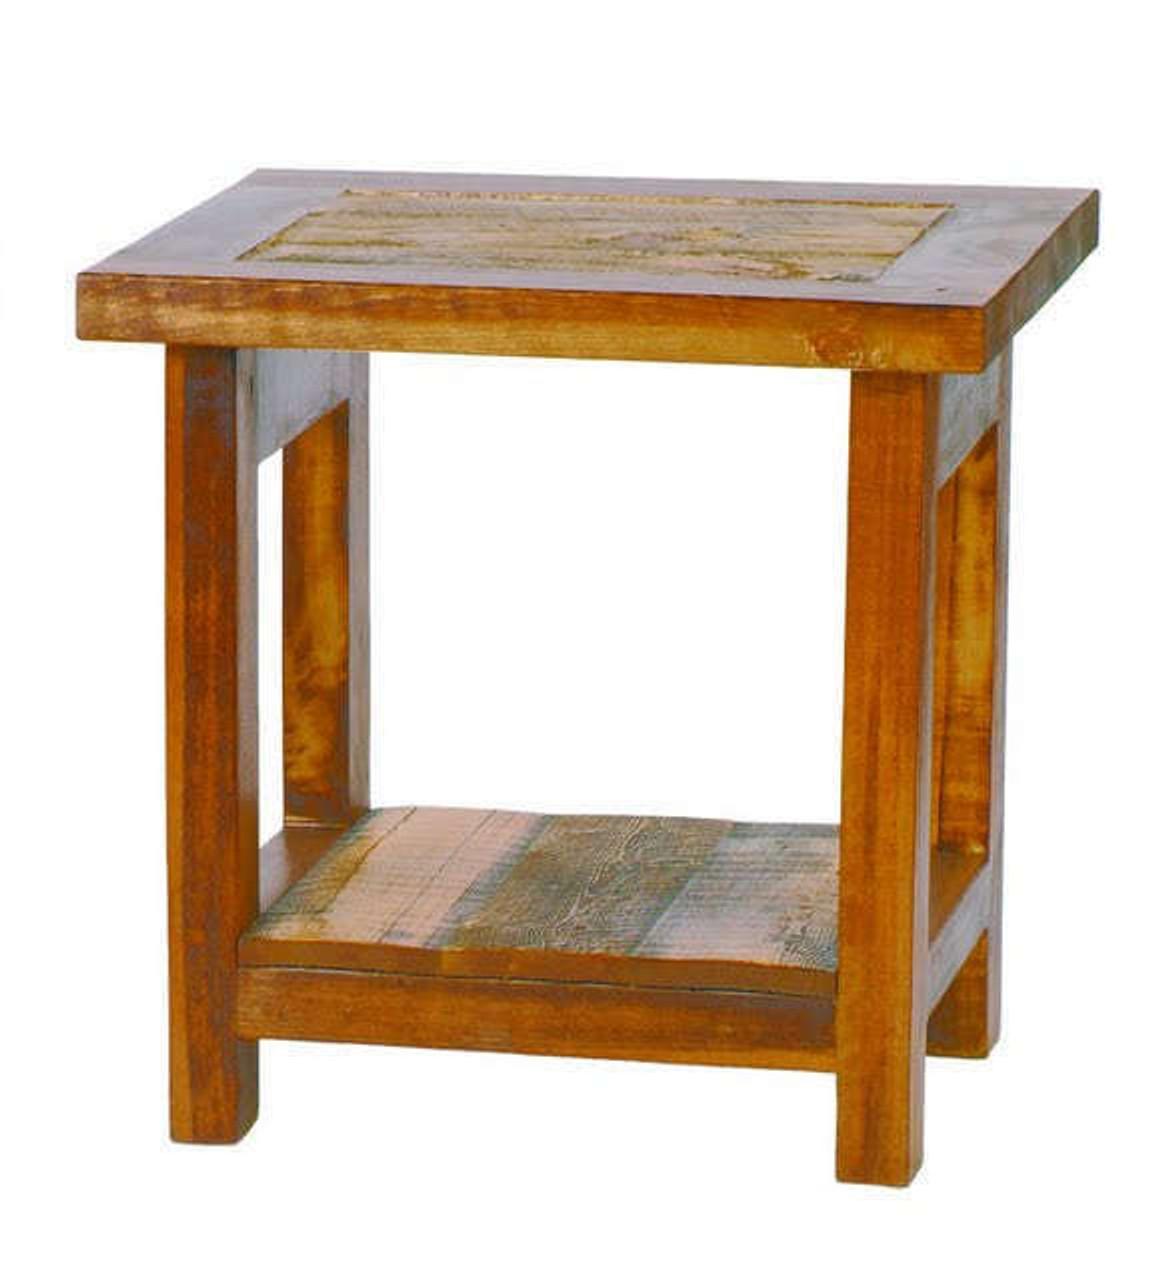 Rustic Reclaimed Wood End Table   Natural Barnwood